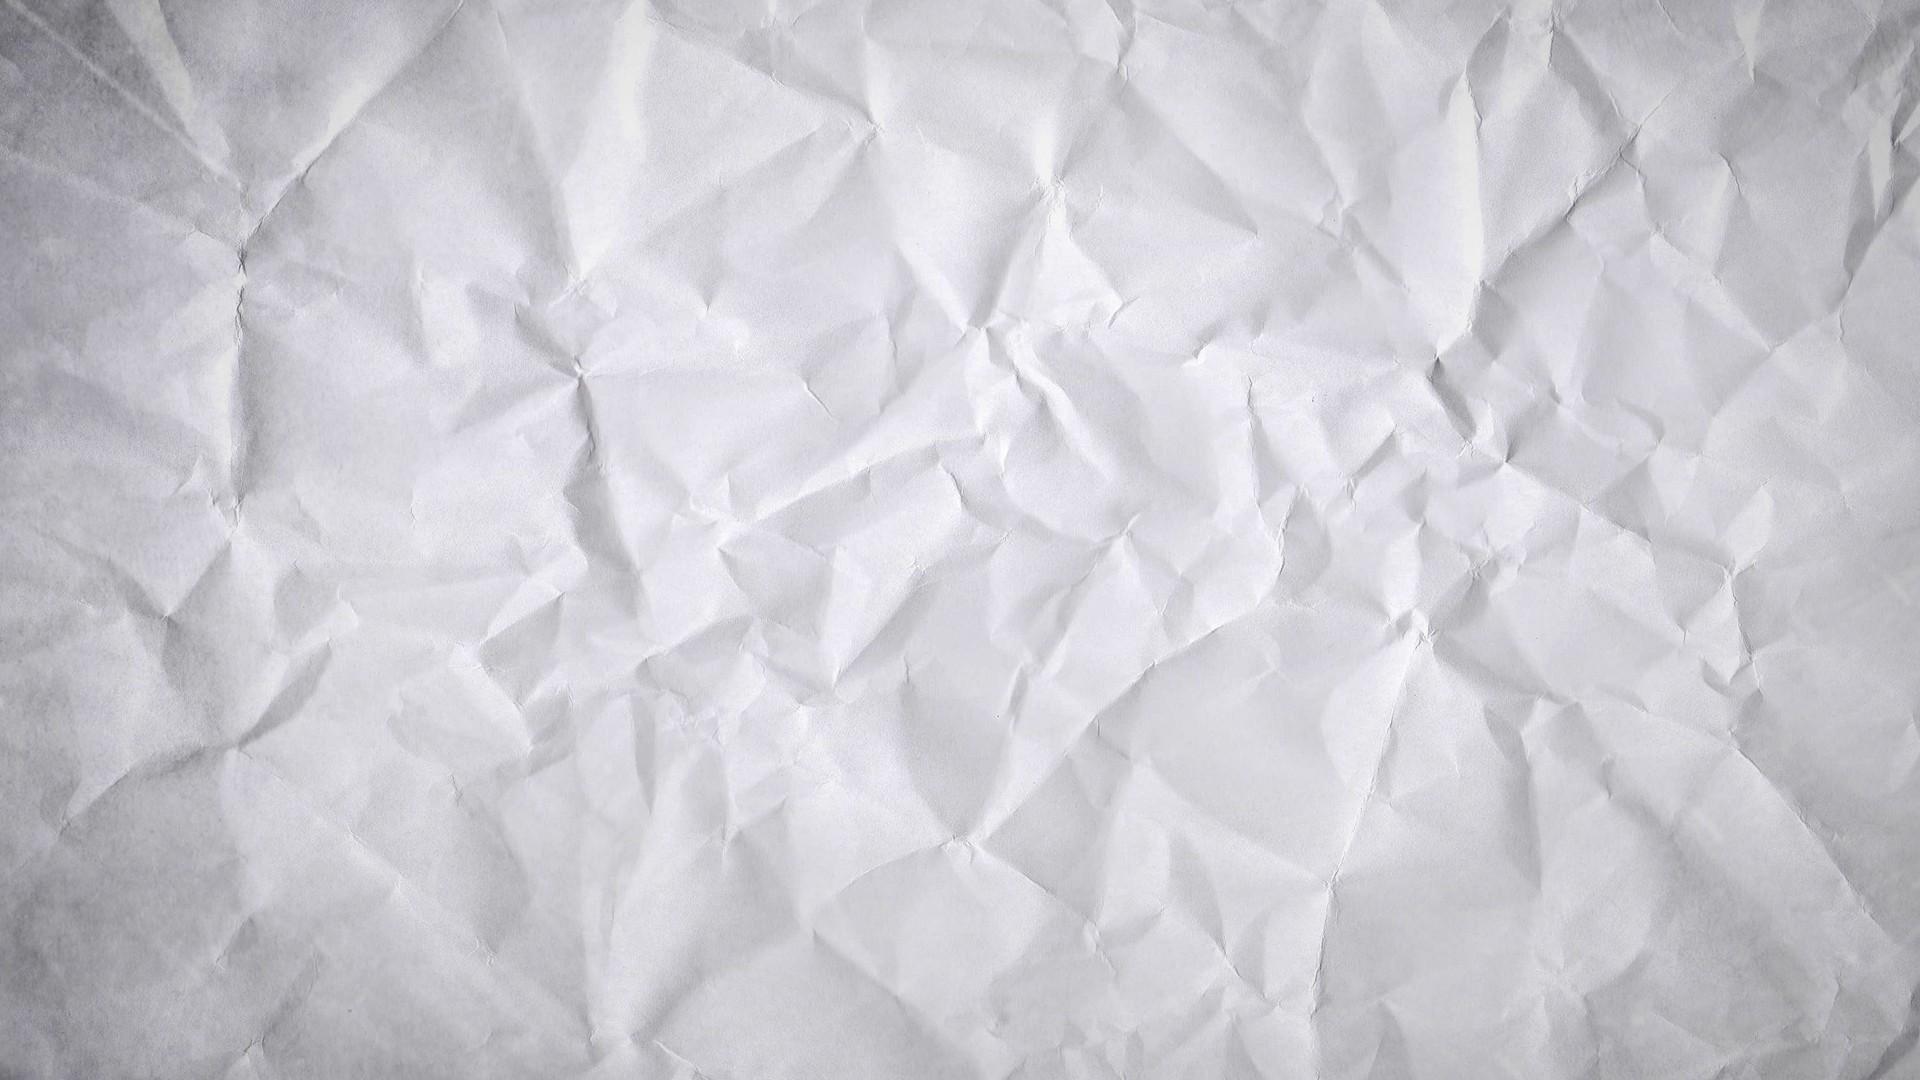 Crumpled Paper Texture Wallpaper (47 Wallpapers)